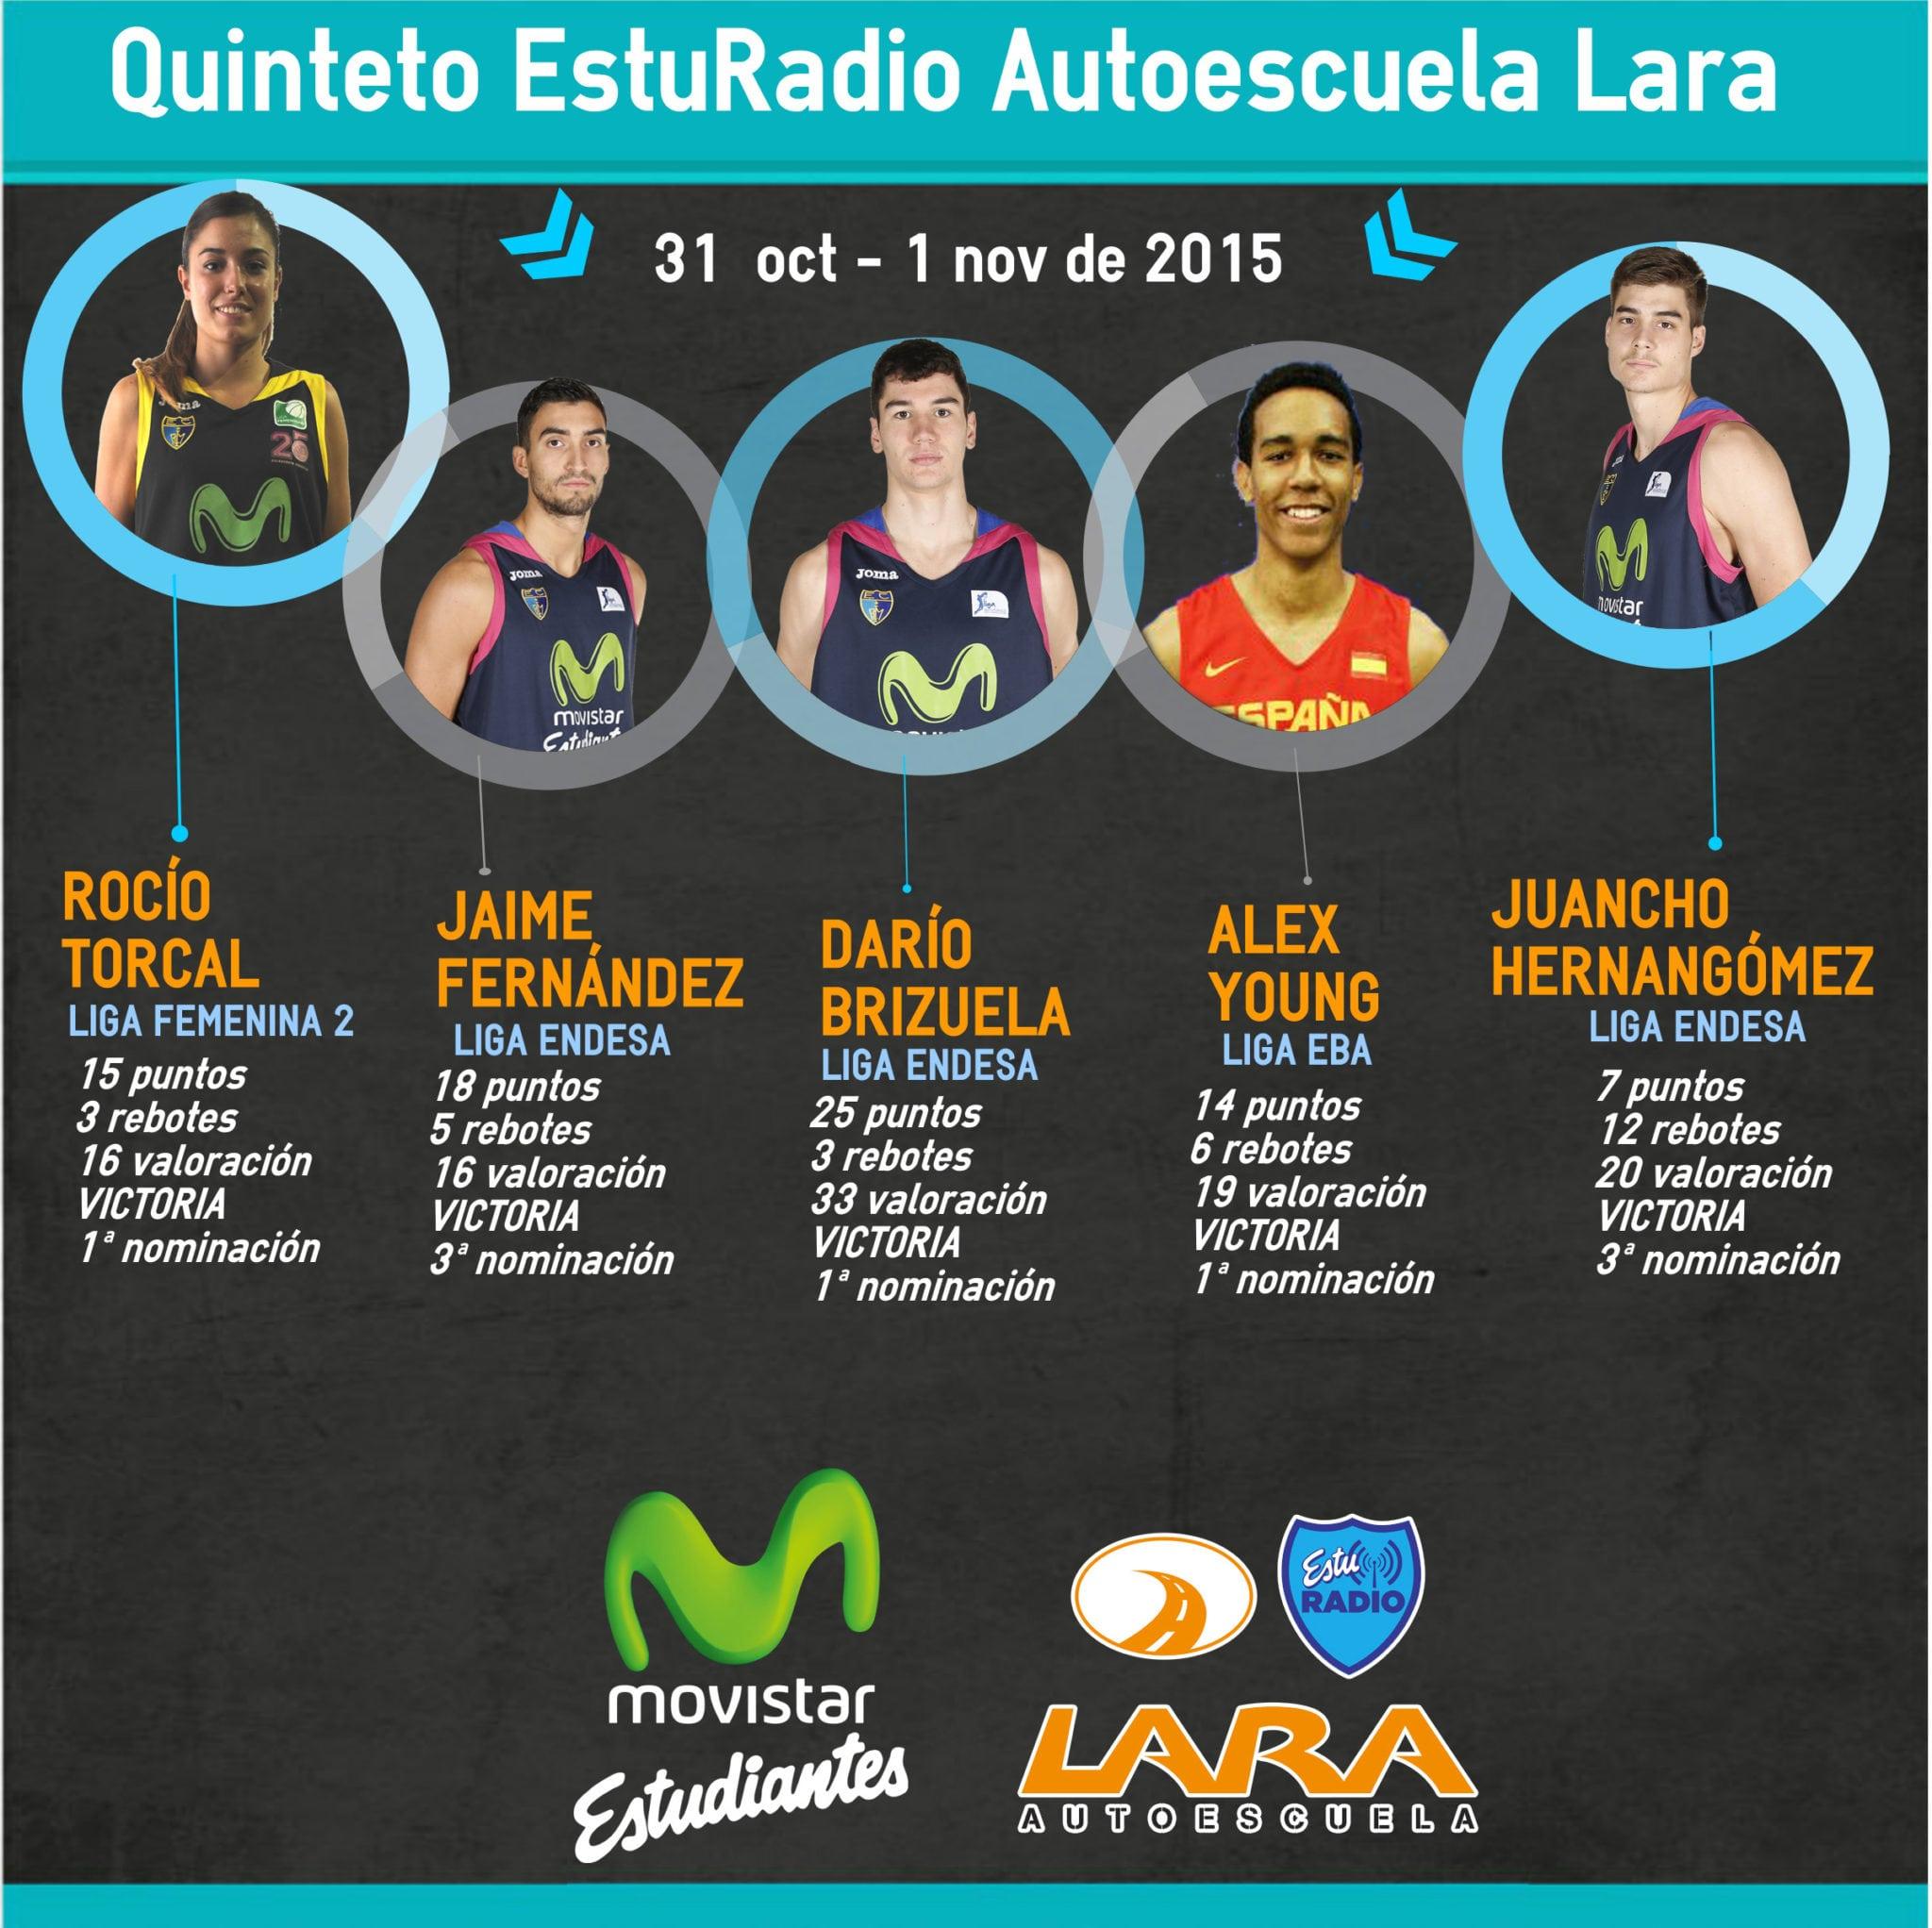 3er Quinteto EstuRadio: Rocío Torcal, Jaime Fernández, Darío Brizuela, Alex Young y Juancho Hernangómez